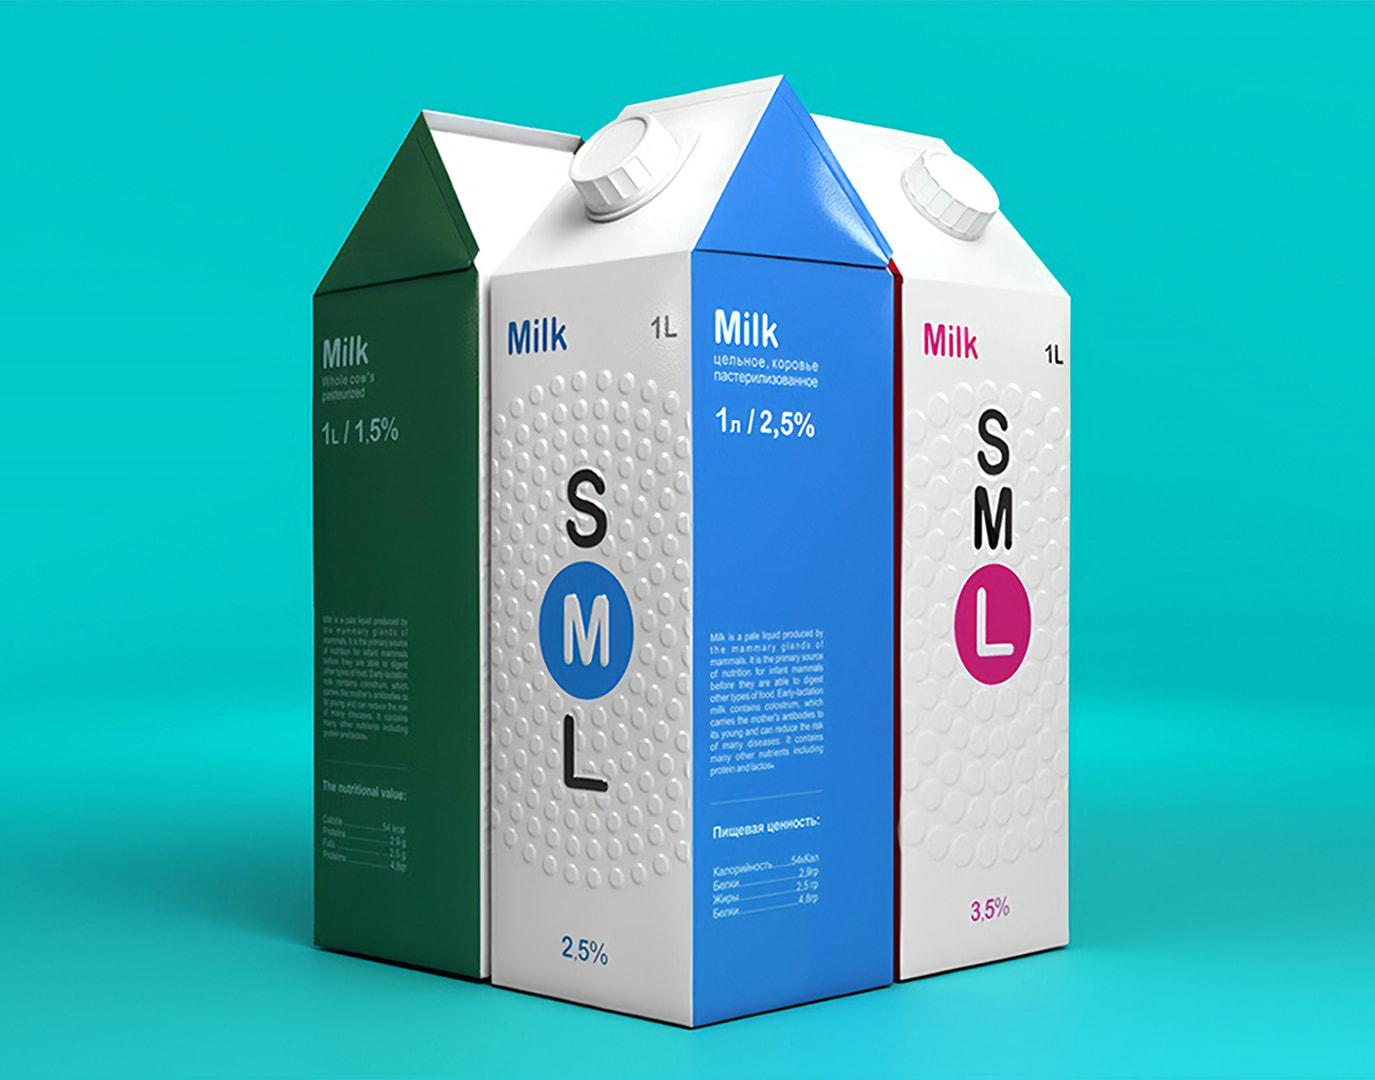 SML milk